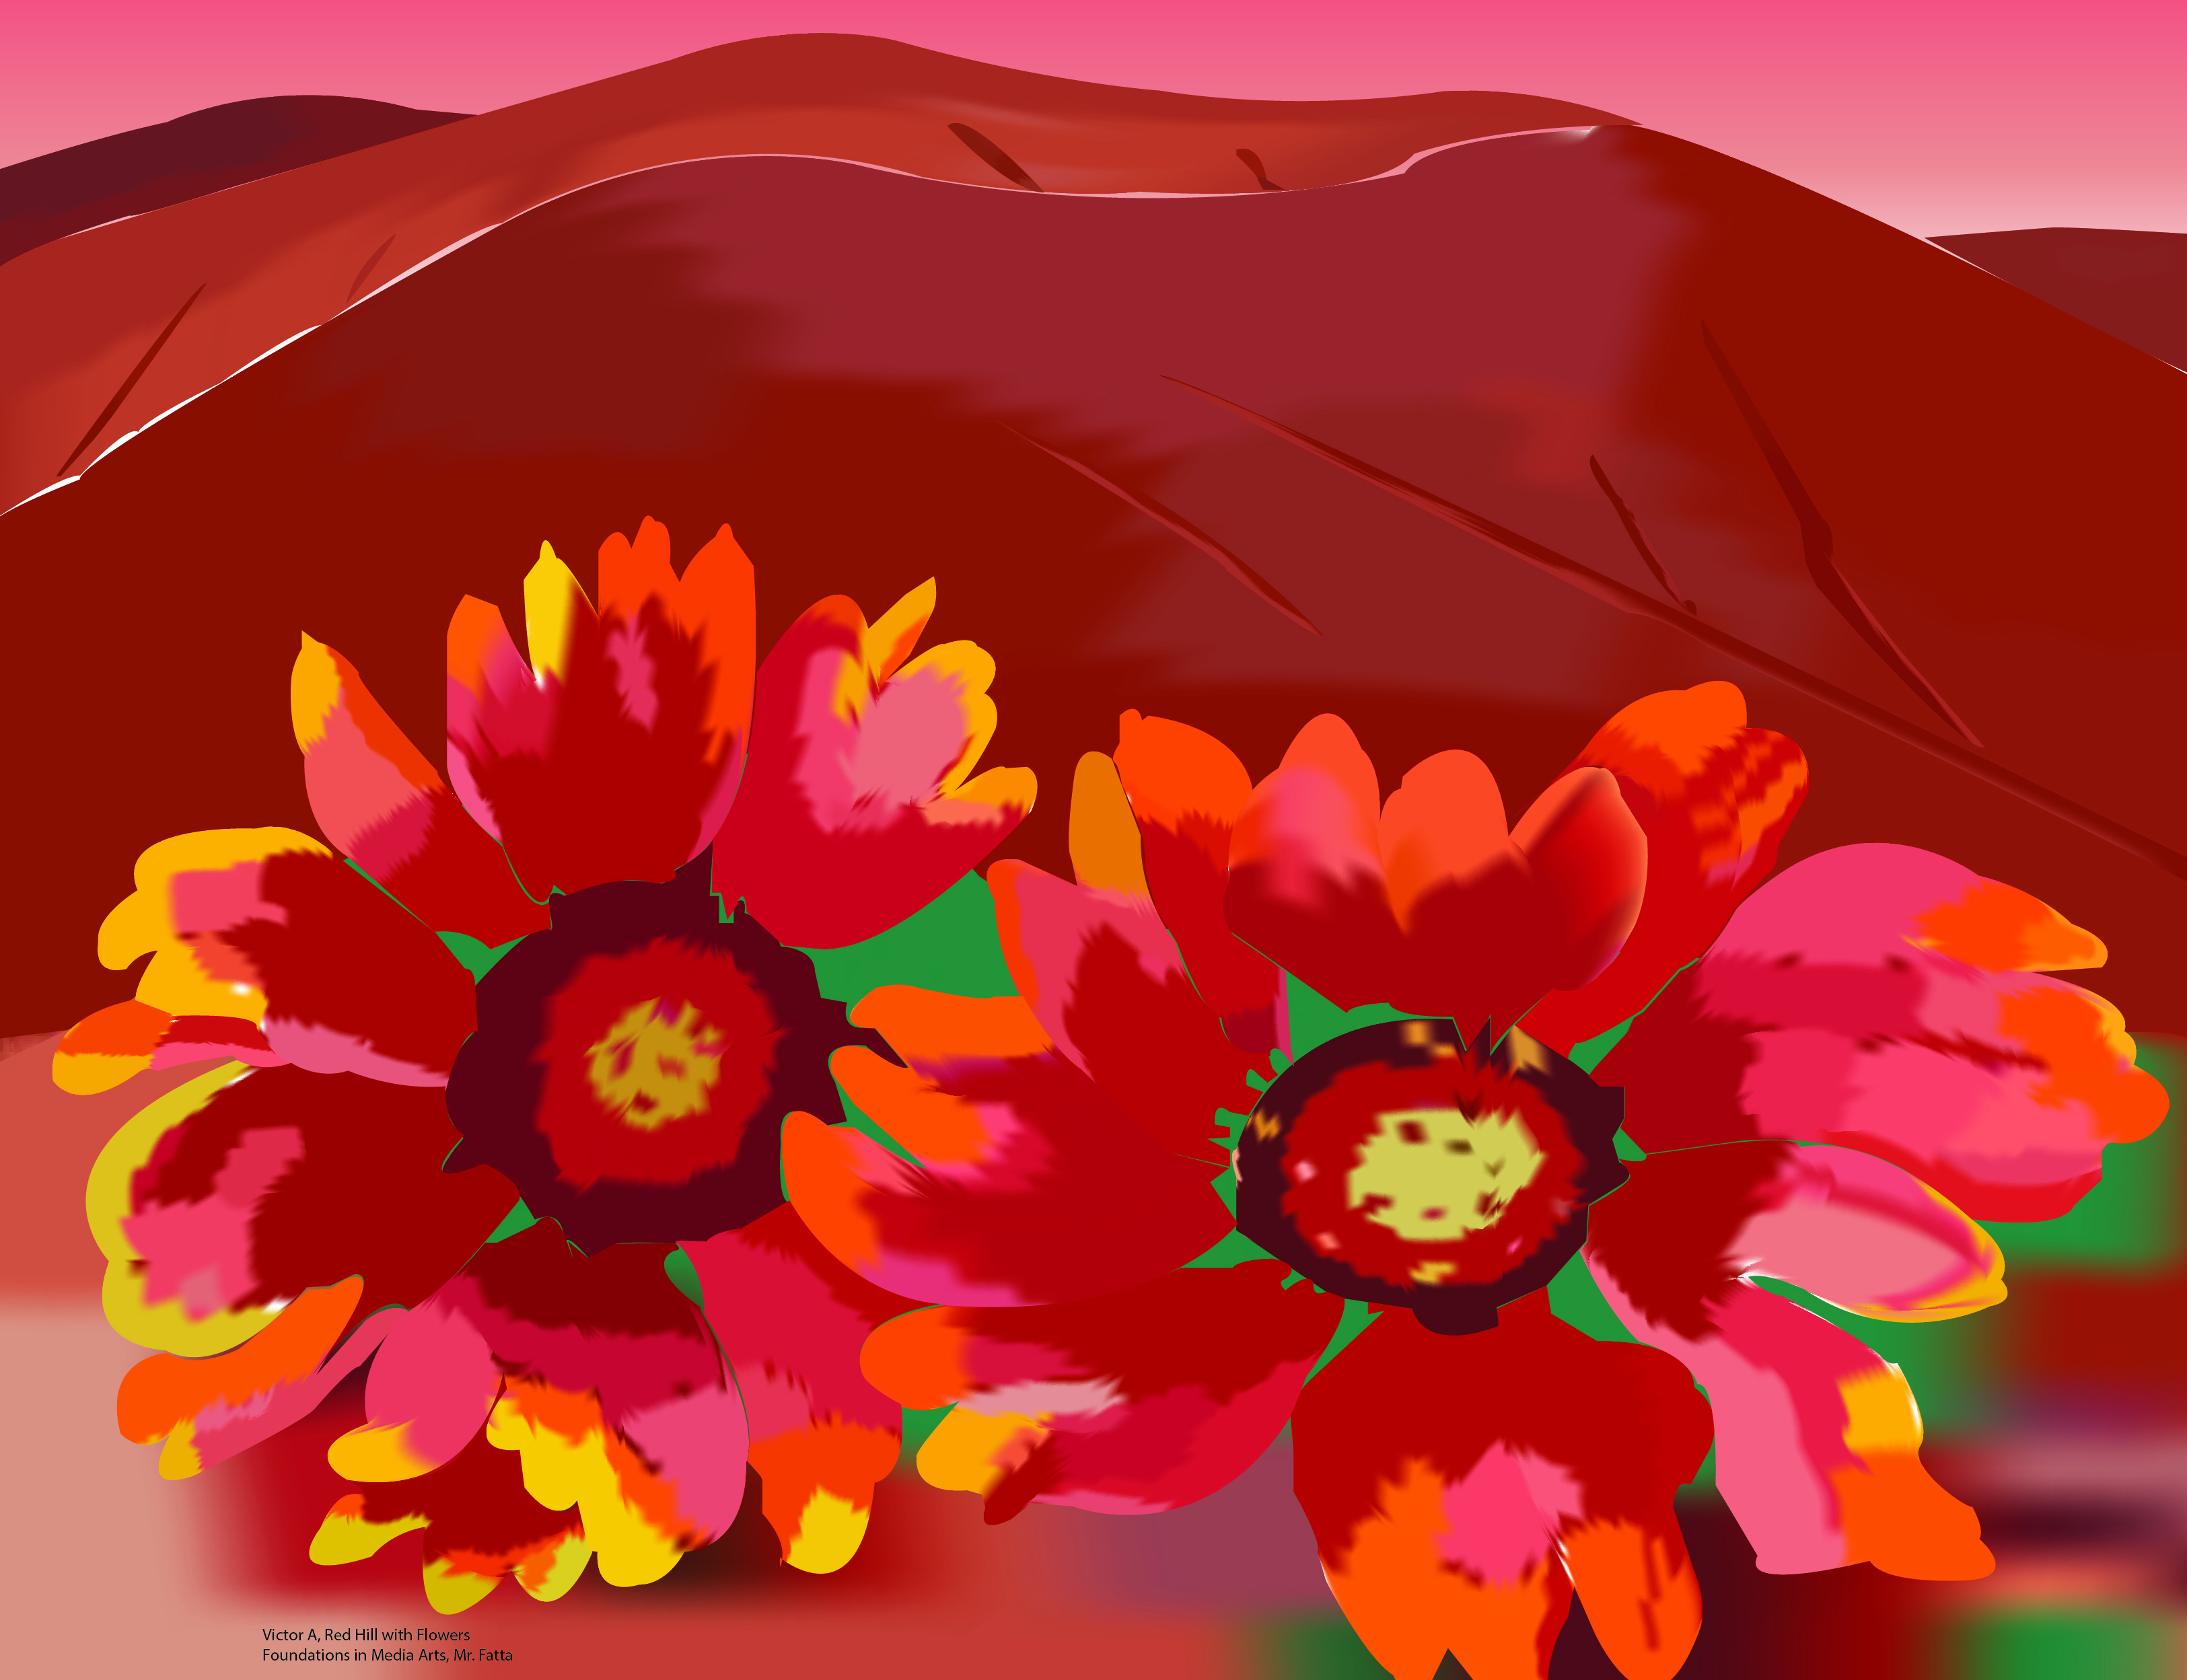 Flower_RedHills_AquinoVictor